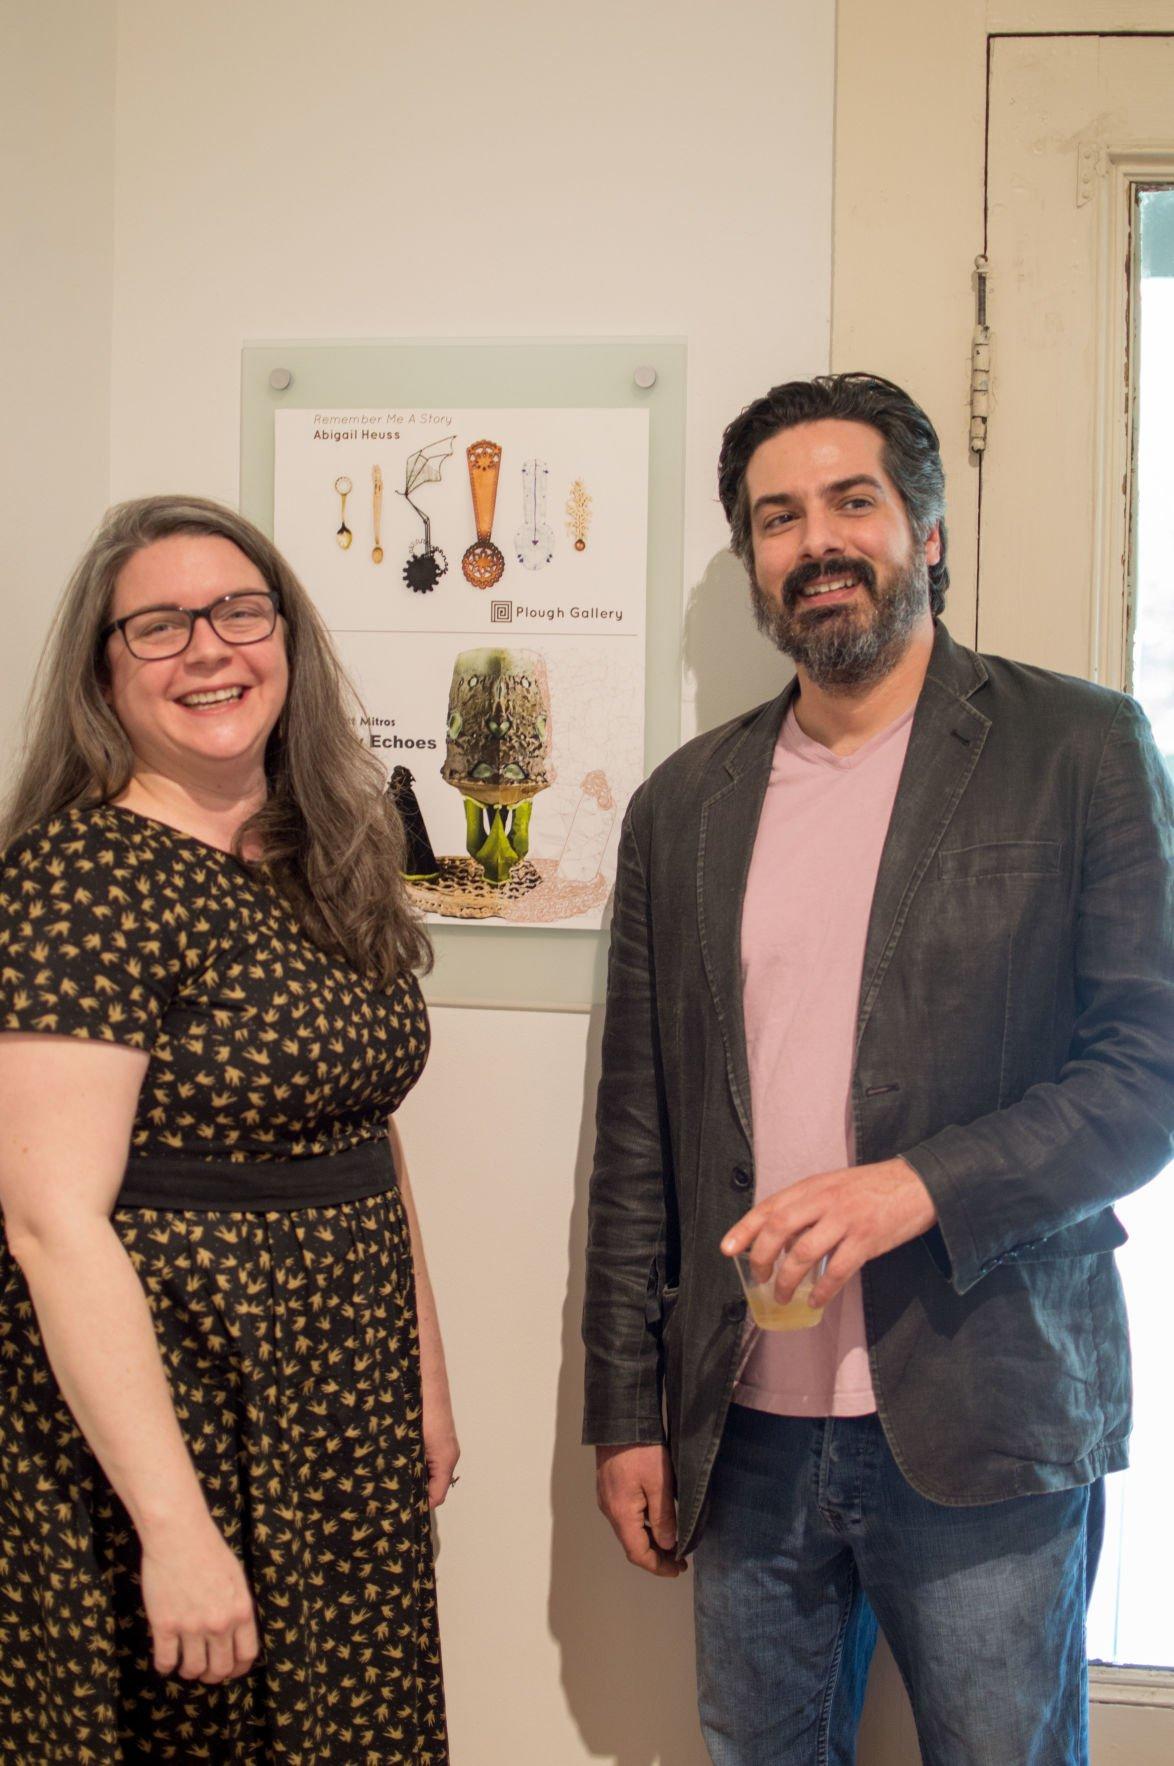 Artists Abigail Heuss and Matt Mitros at Plough Gallery.